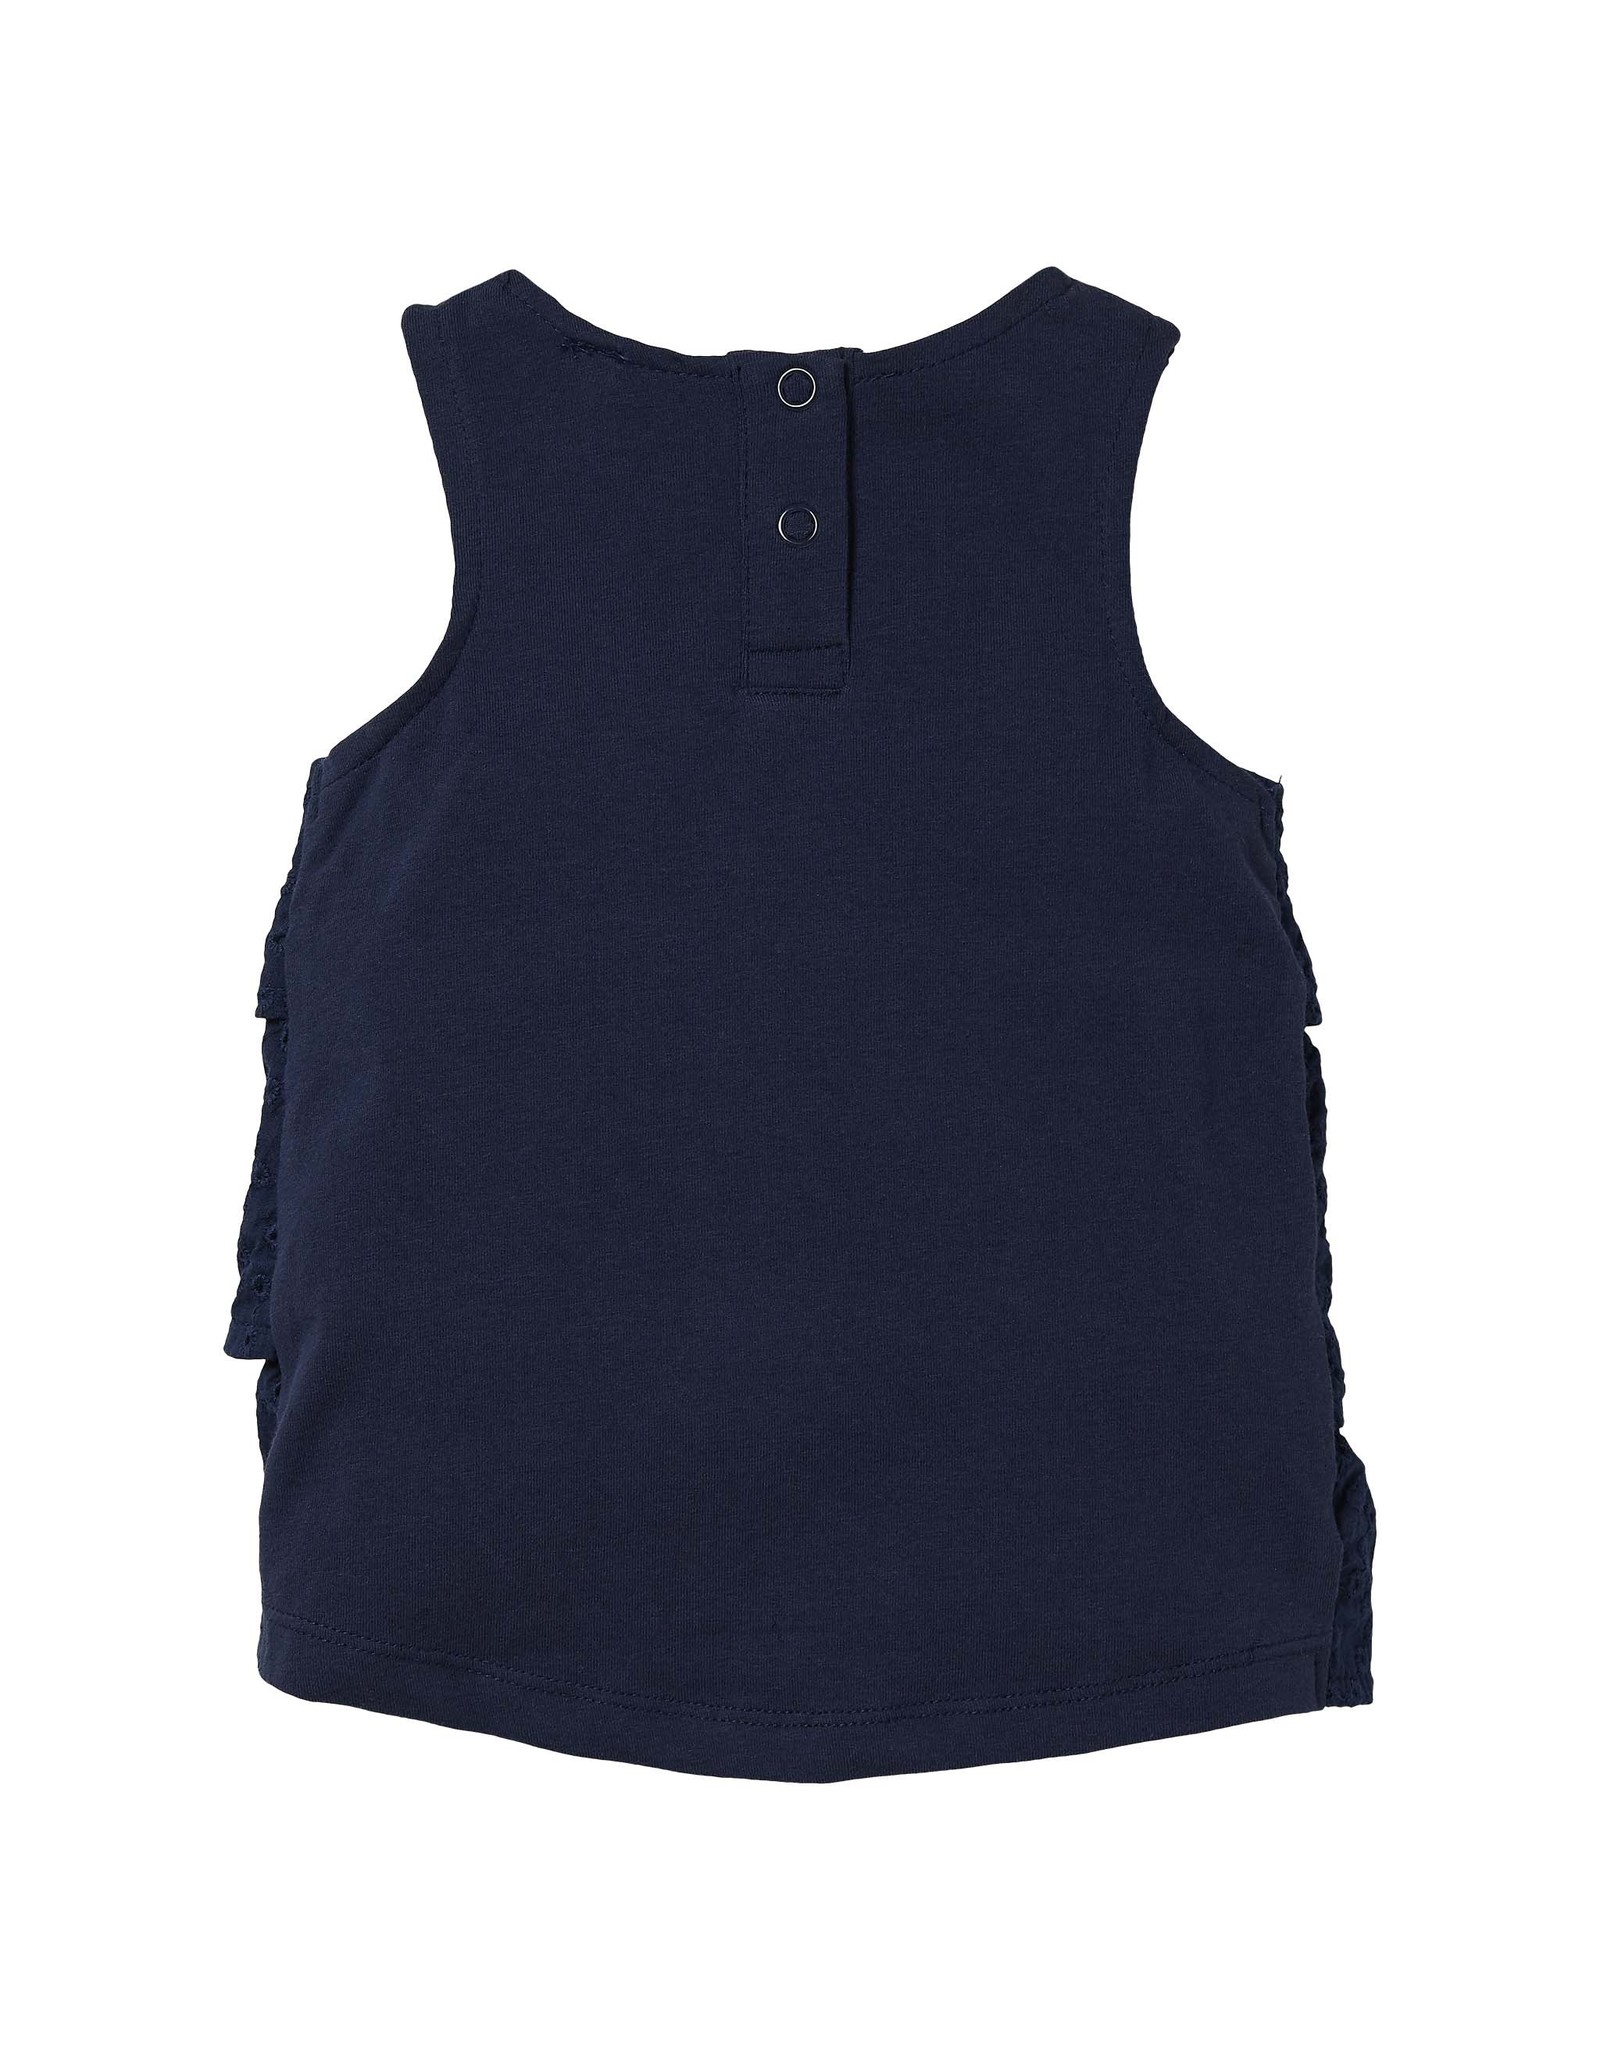 Quapi Quapi baby meisjes mouwloze jurk Grietje Dark Blue